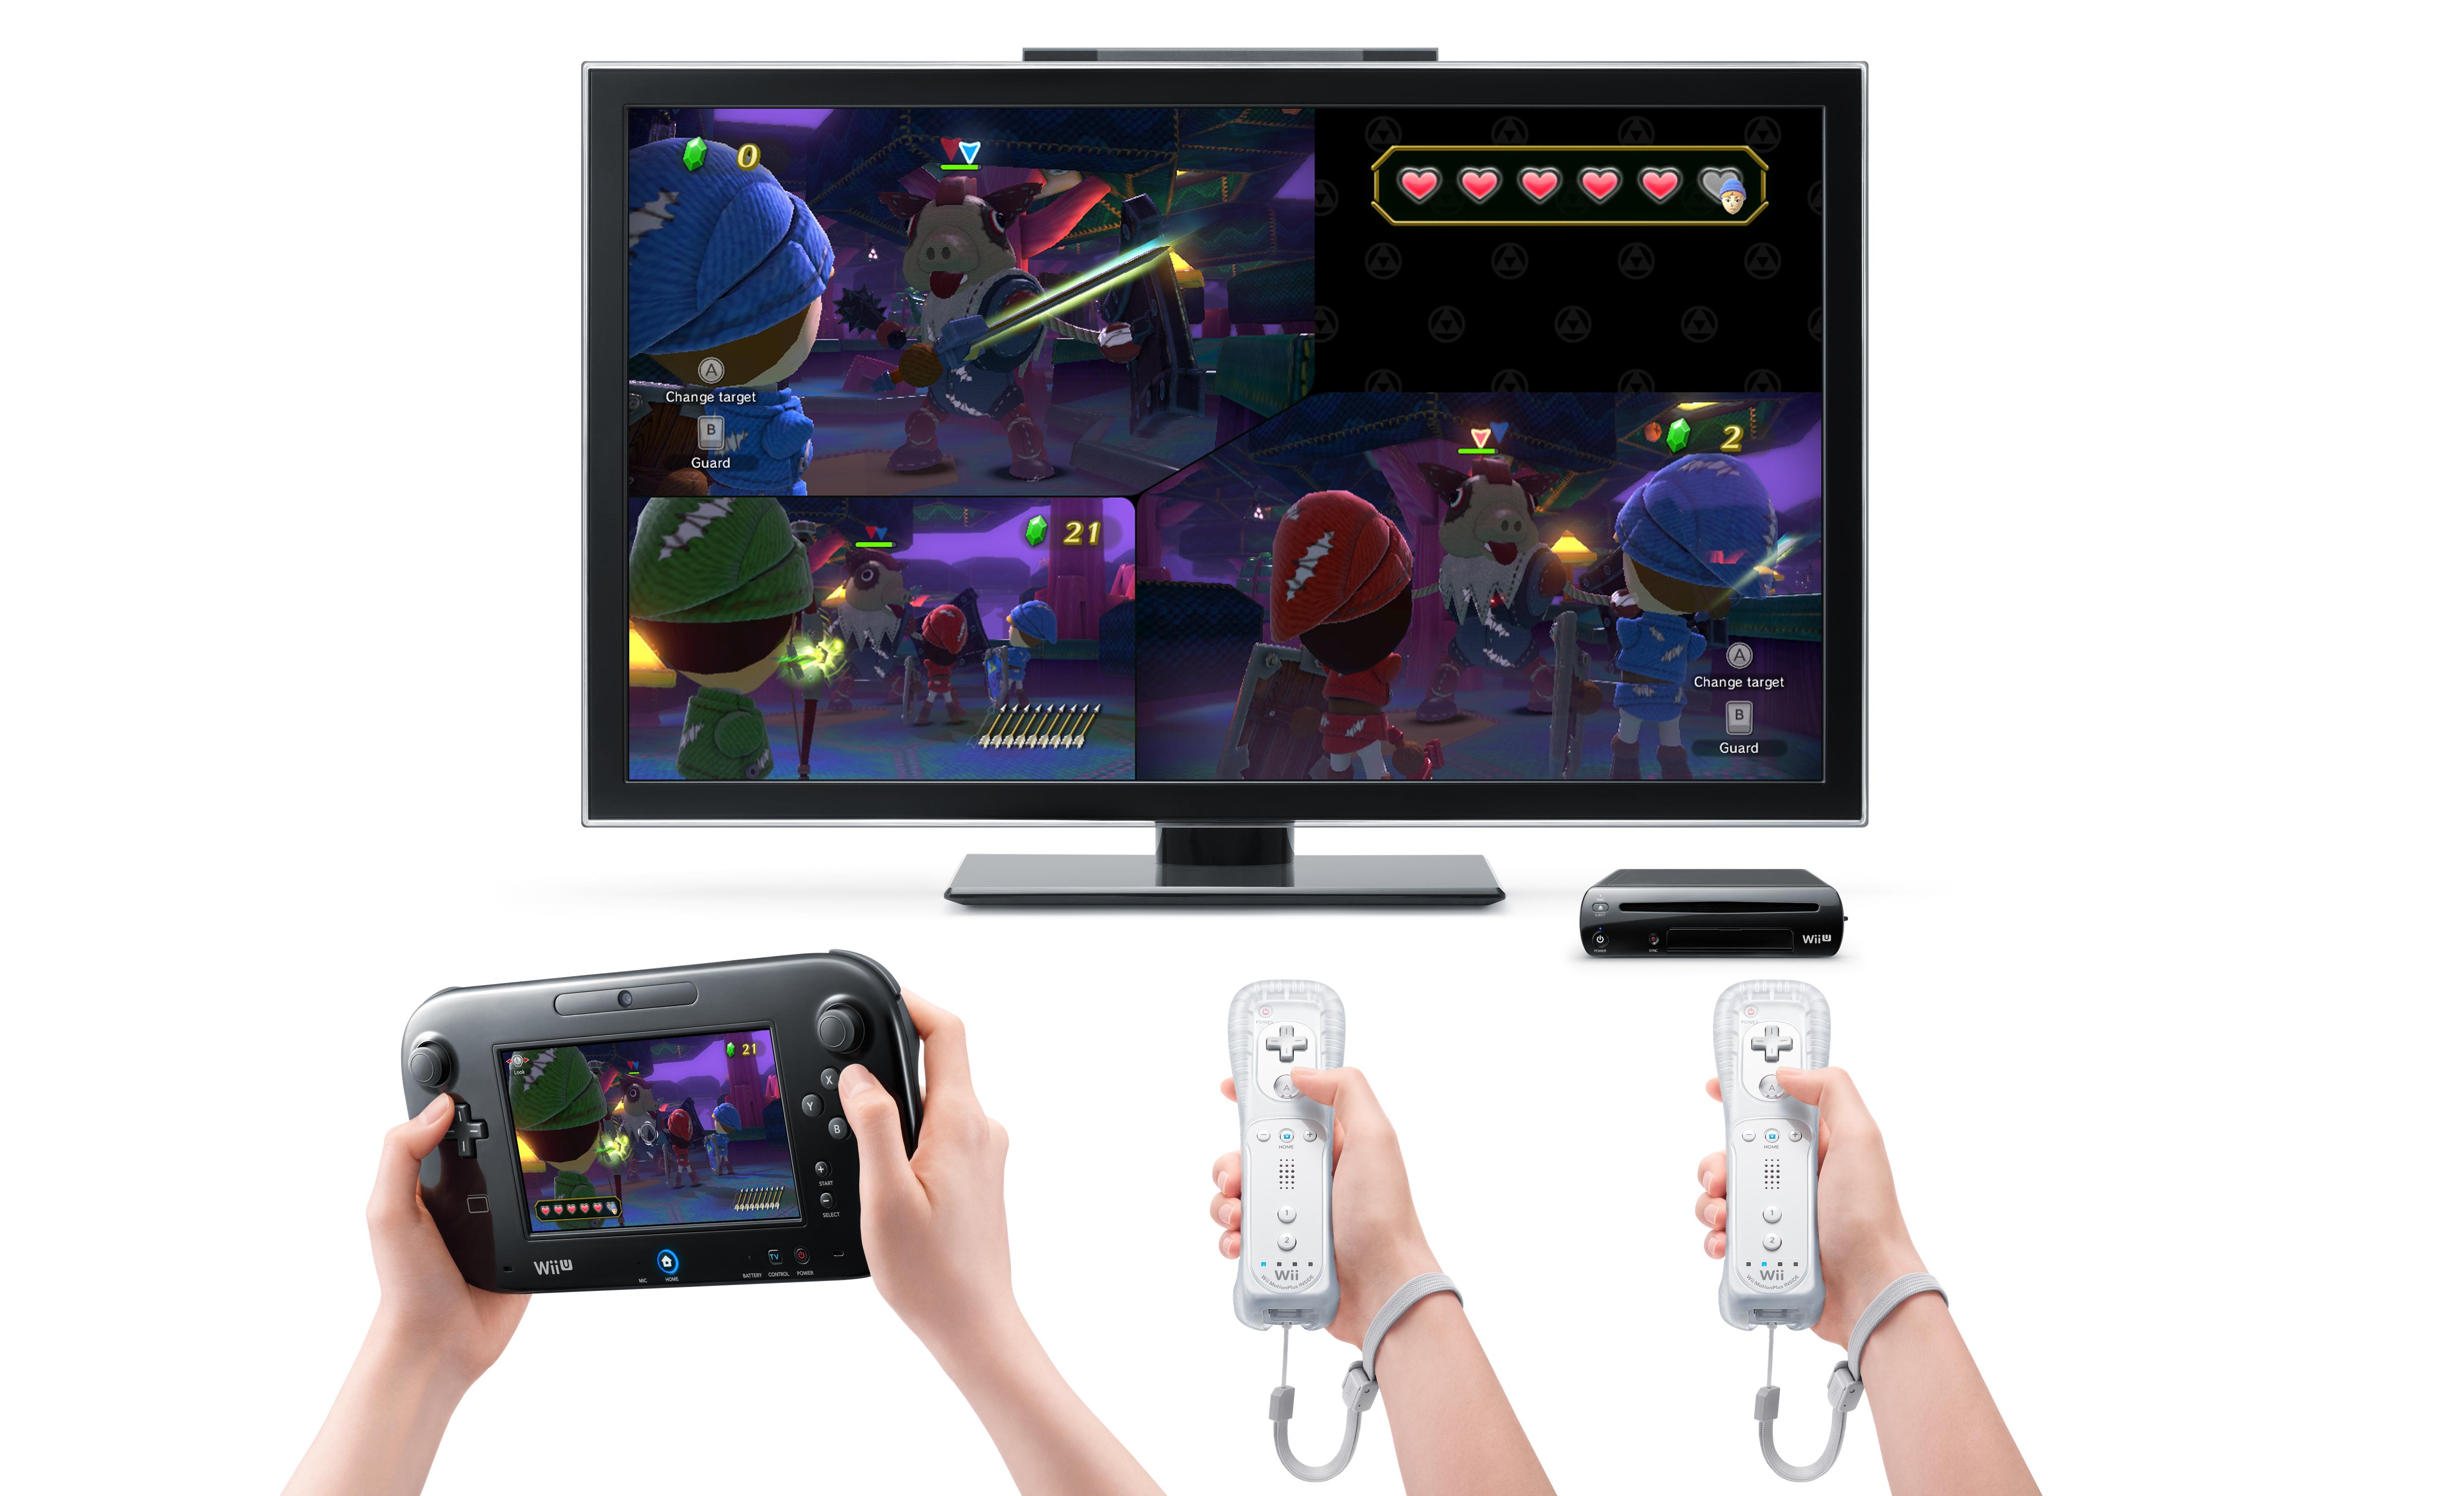 Zelda Battle Quest - #NintendoLand #WiiU (With images)   Wii u, Review  games, Games